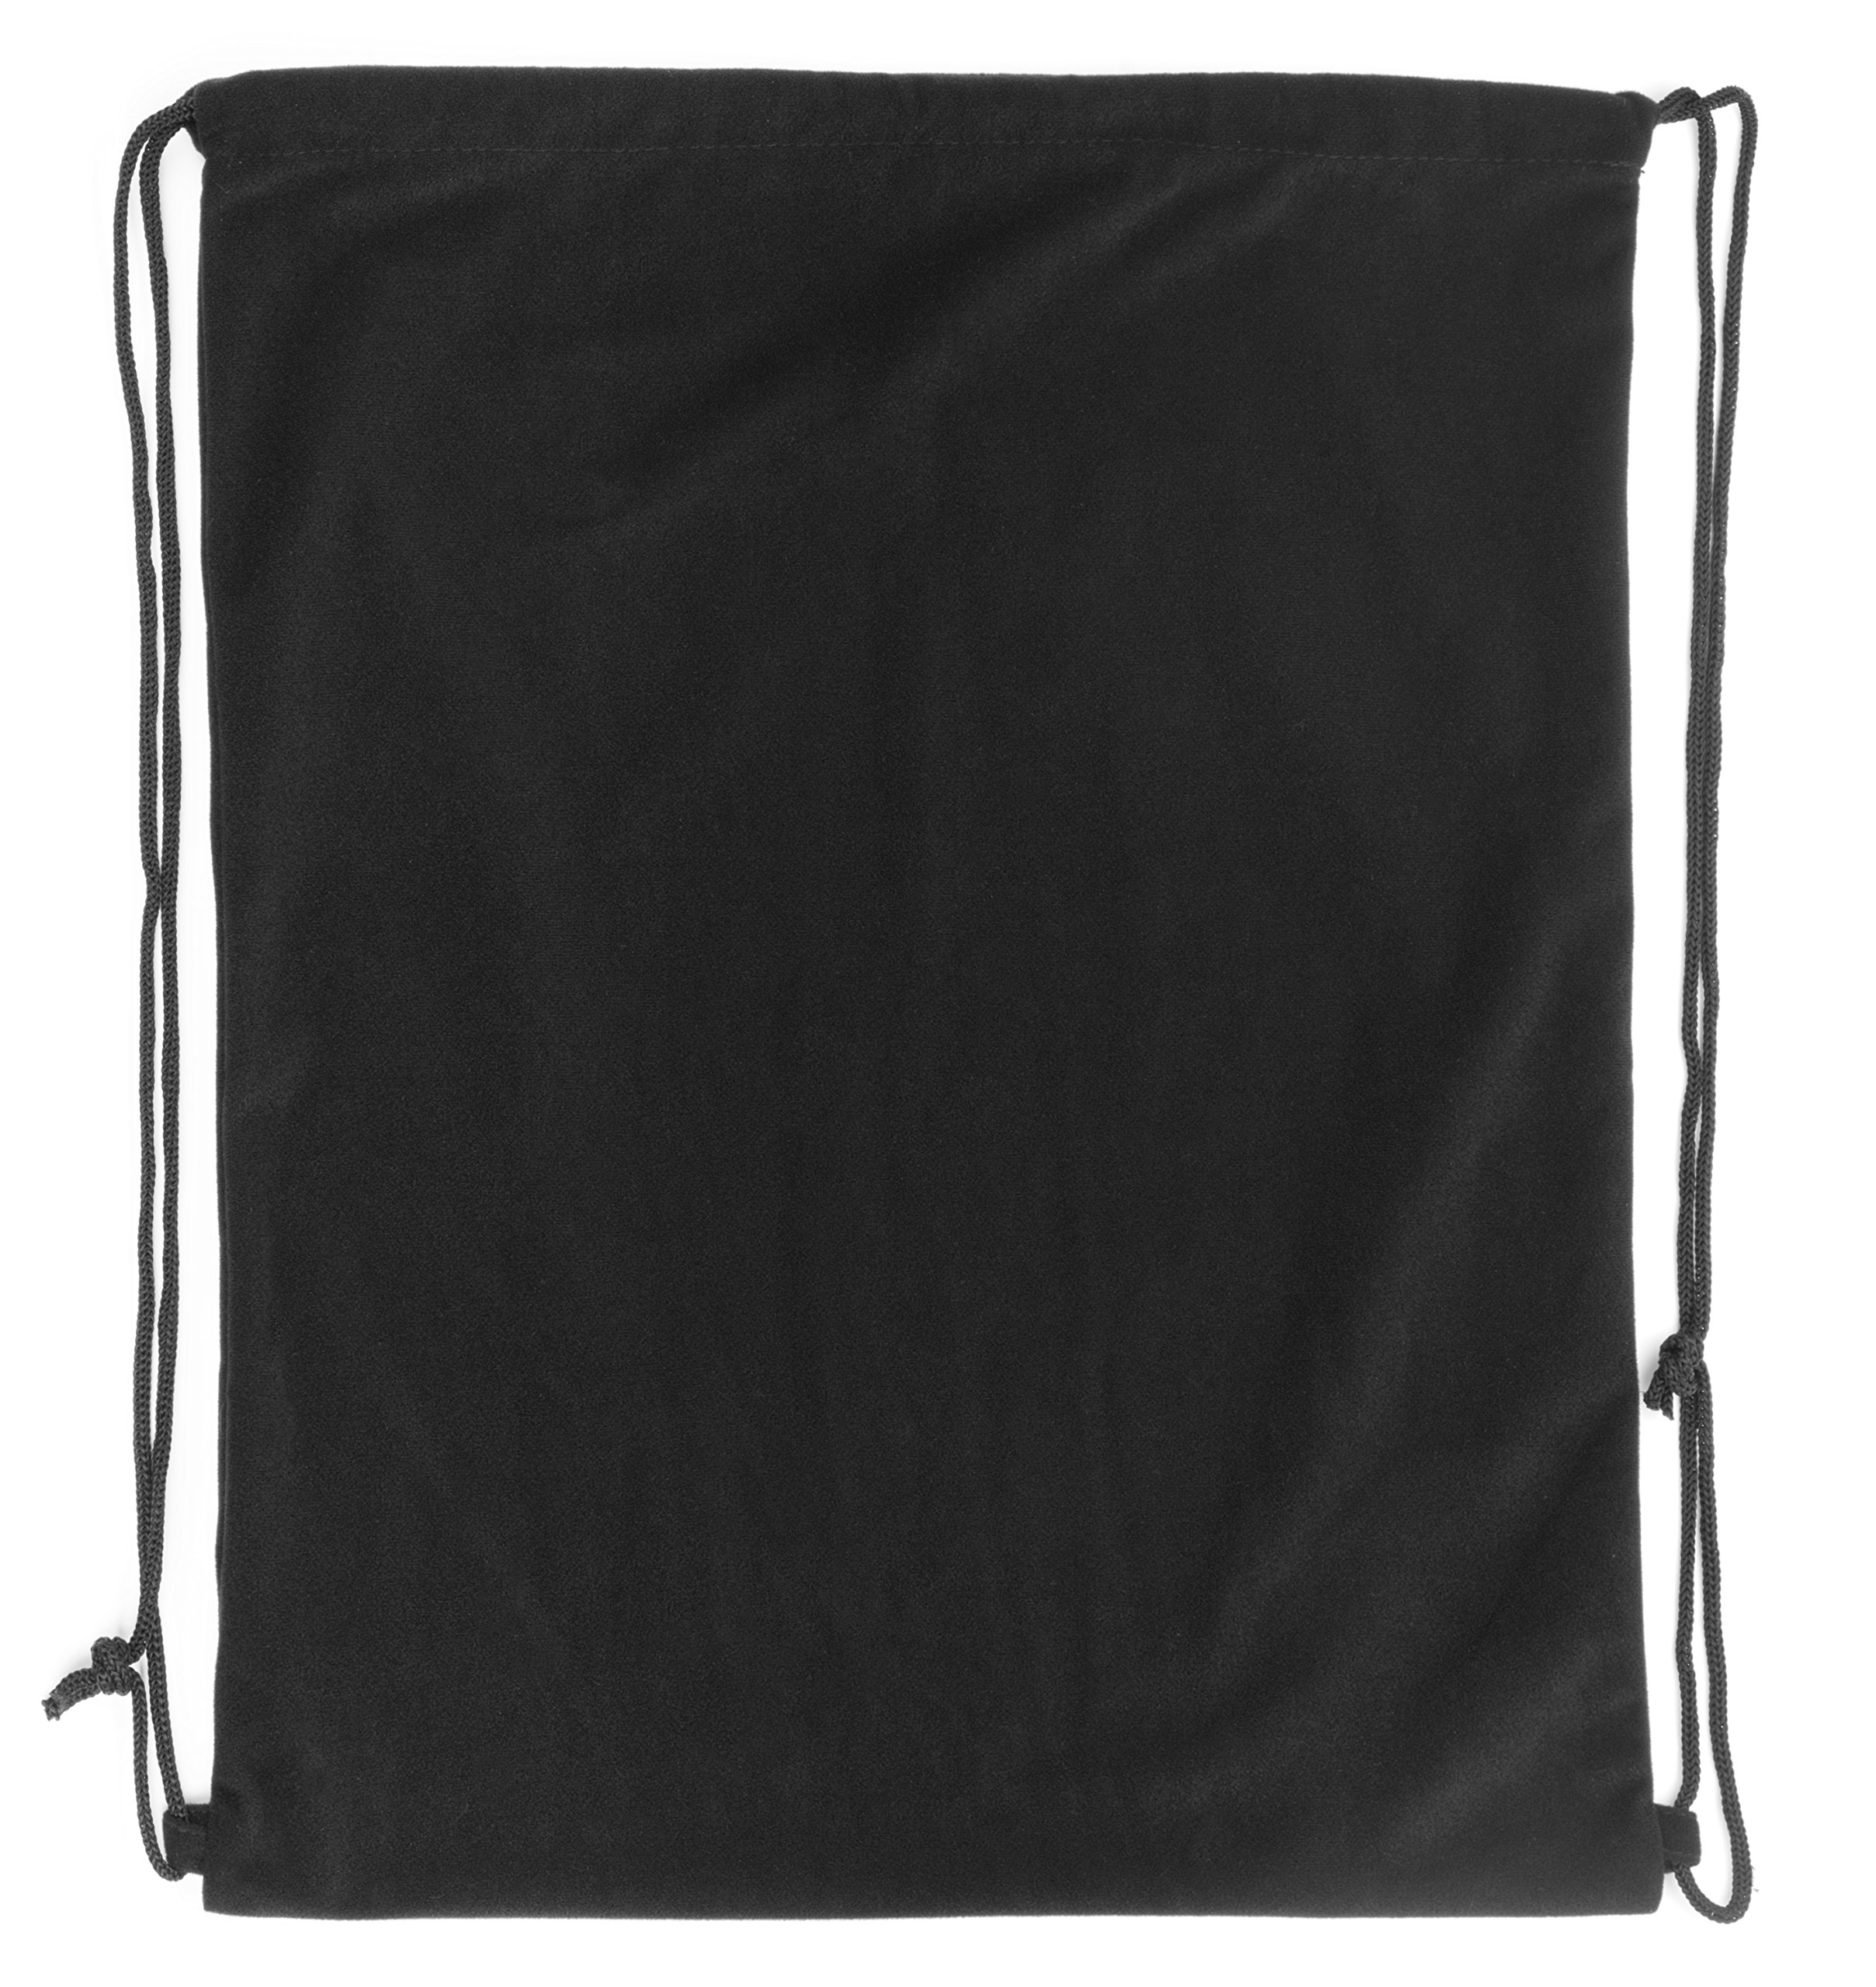 "Pardao Velvet Luxury Gift Bag - 17 x 20"" - Large Black Drawstring Backpack - Cloth Swag Bag"